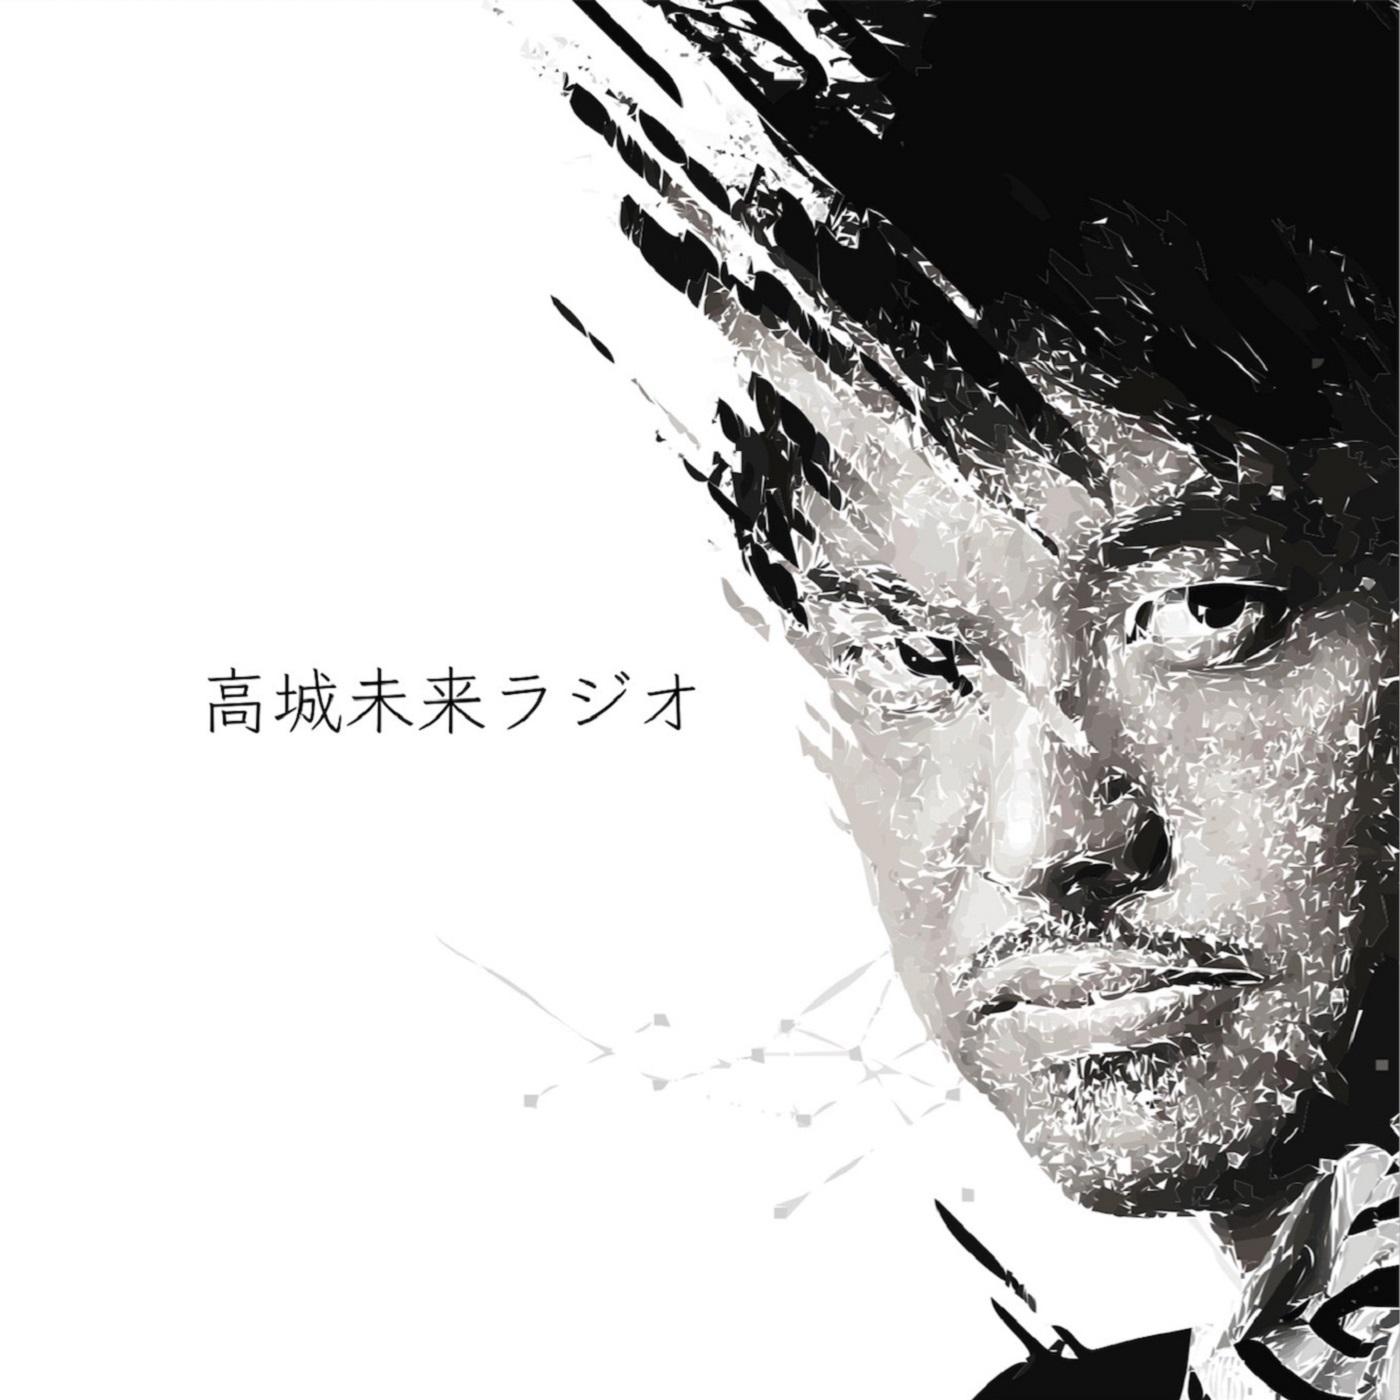 第50回 水面下の領土侵攻 -宮本雅史さん/産経新聞社編集委員 前編